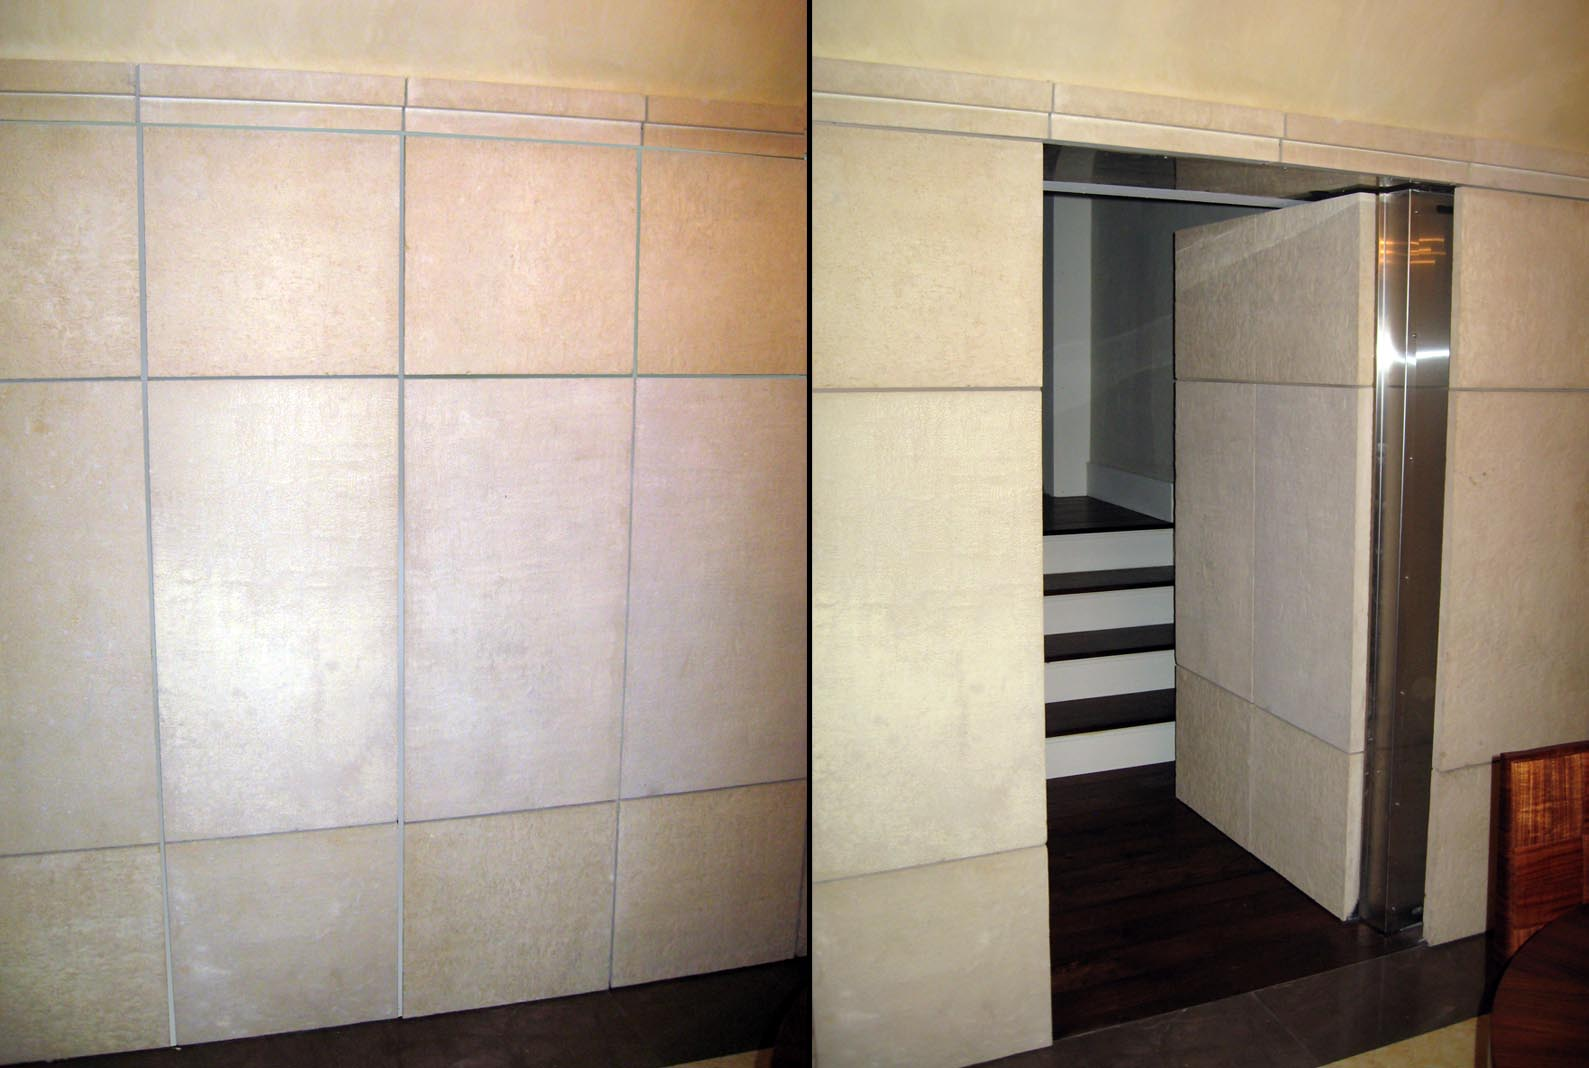 camera ascunsa dupa perete